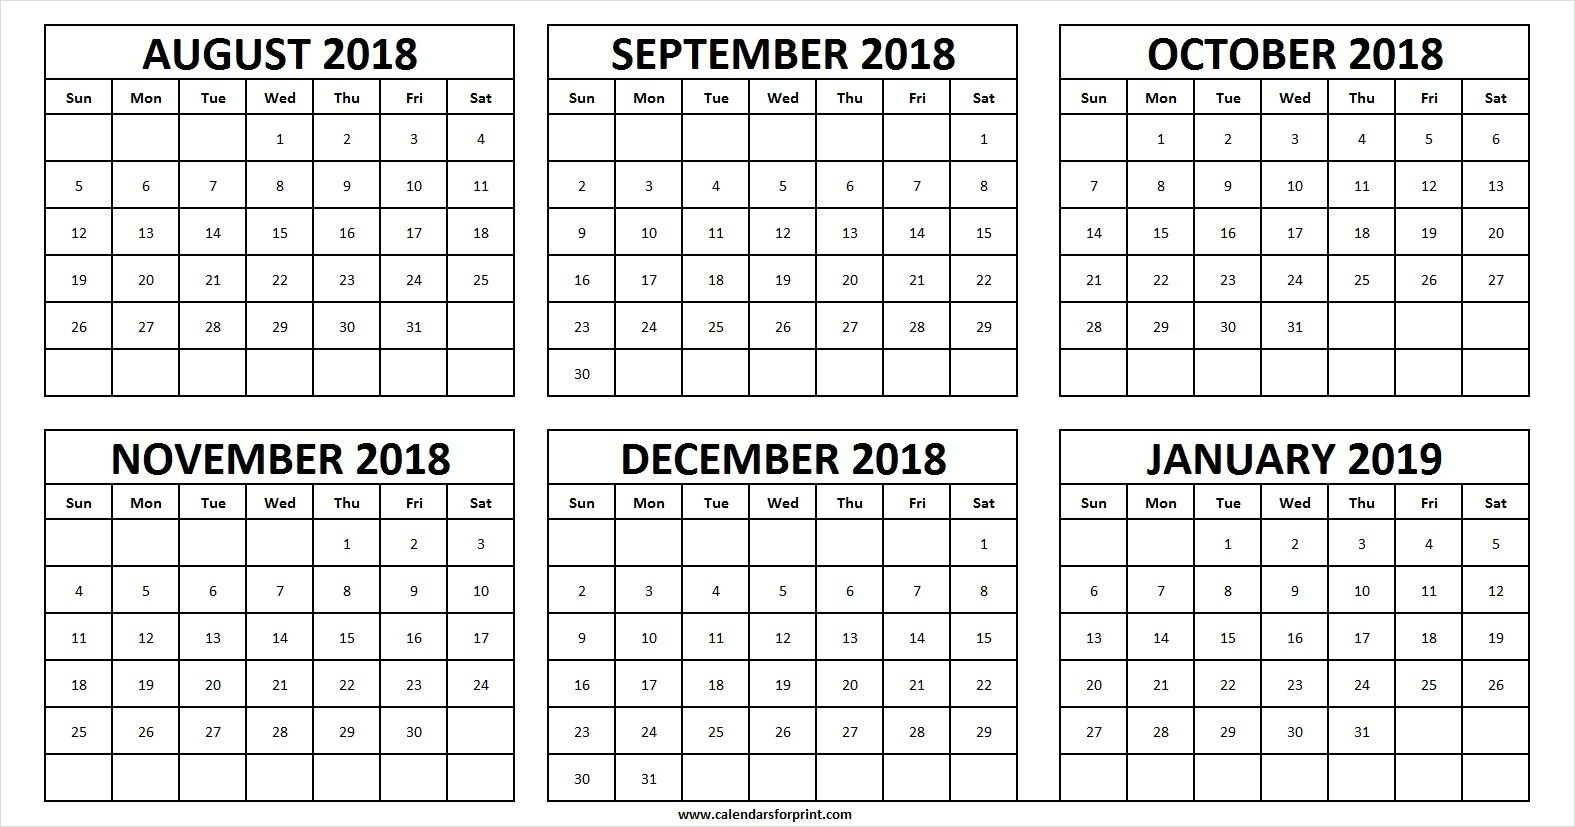 Get August Through December 2019 Calander ⋆ The Best